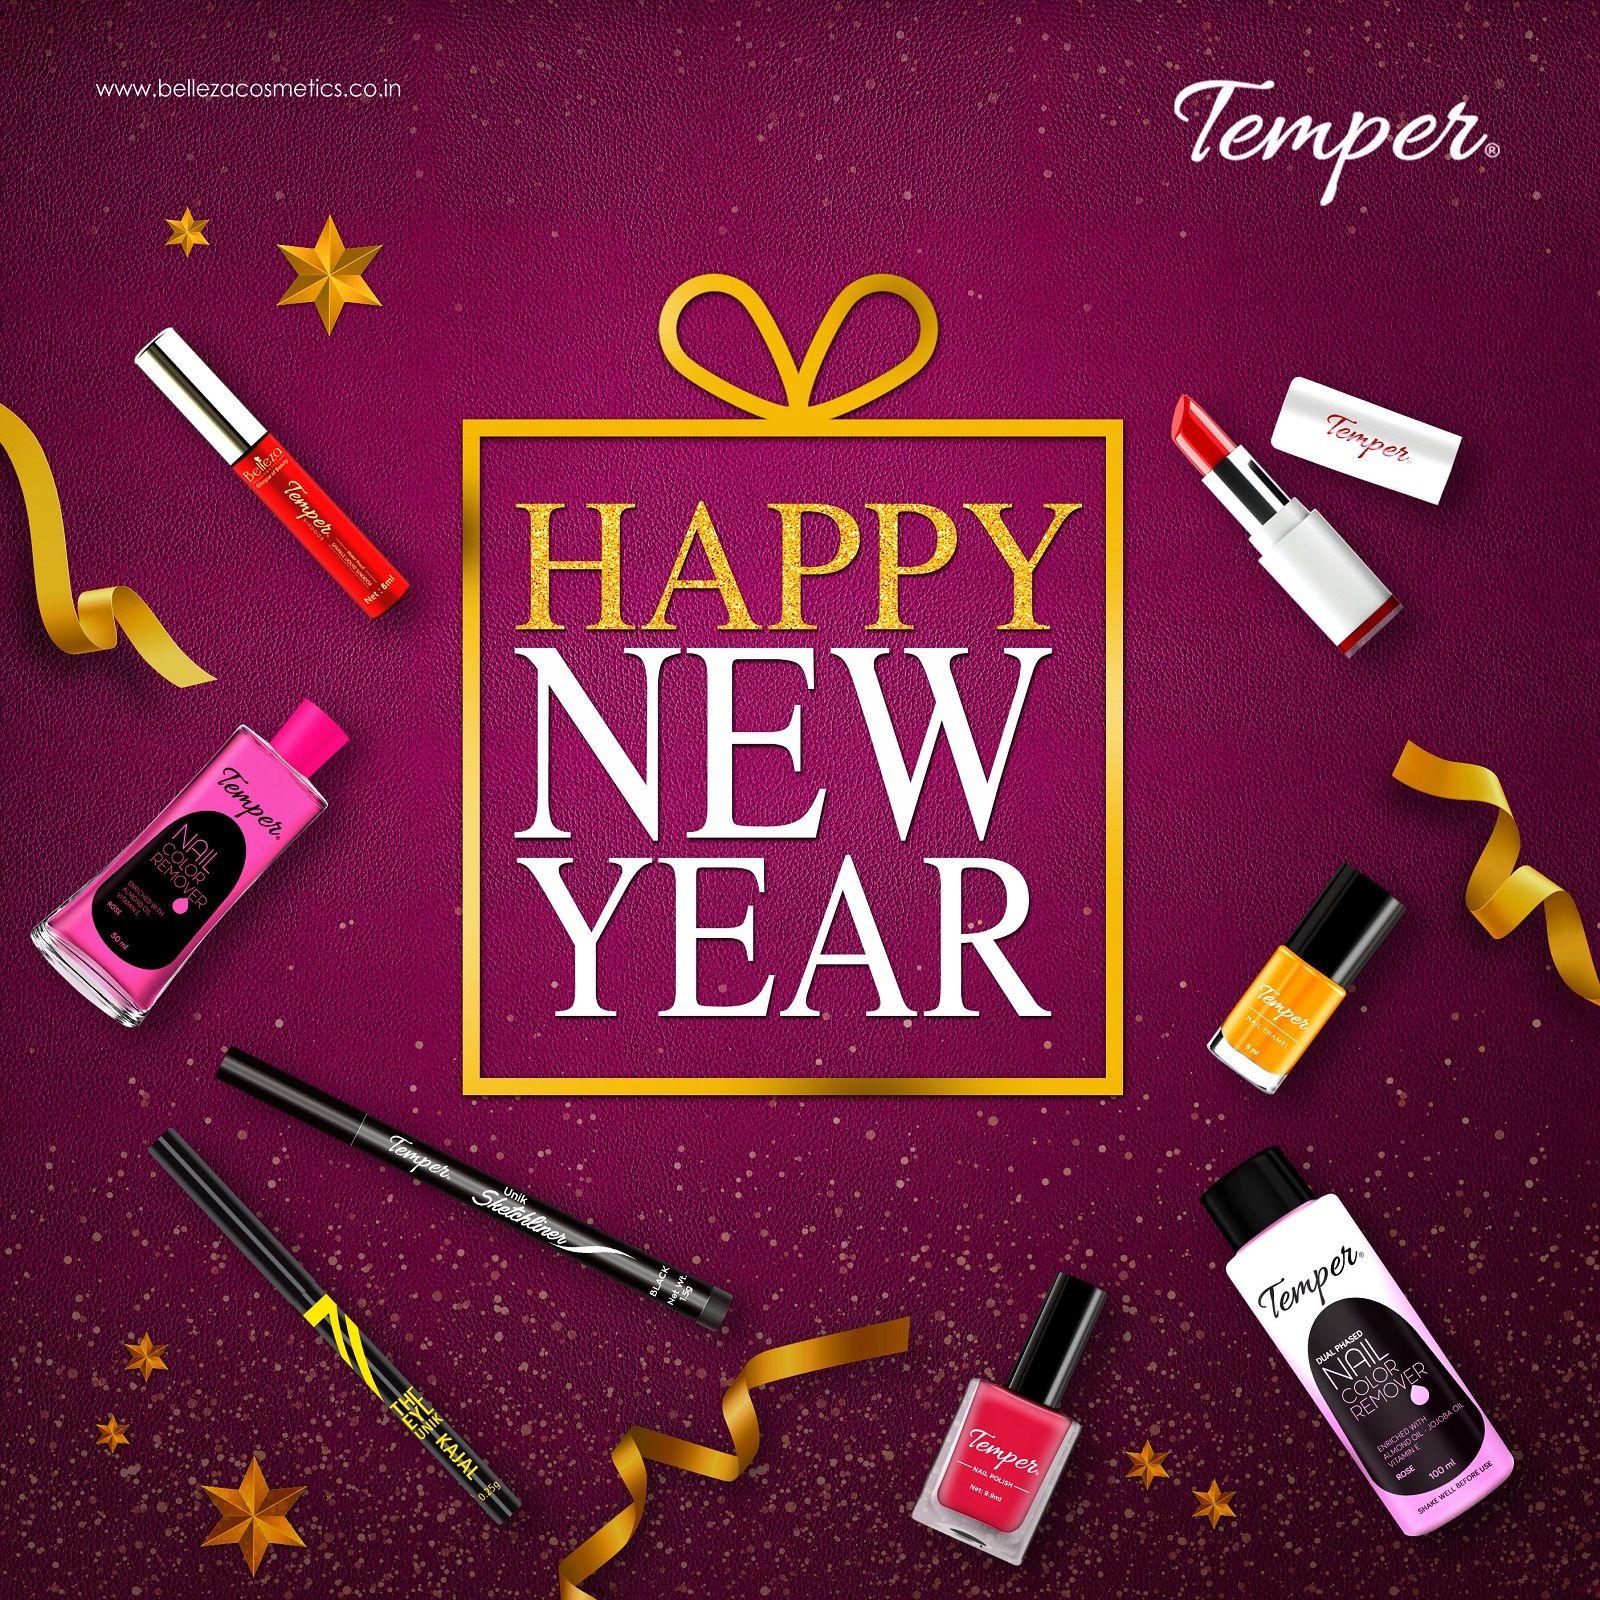 HAPPY NEW YEAR bellezacosmetics HappyNewYear